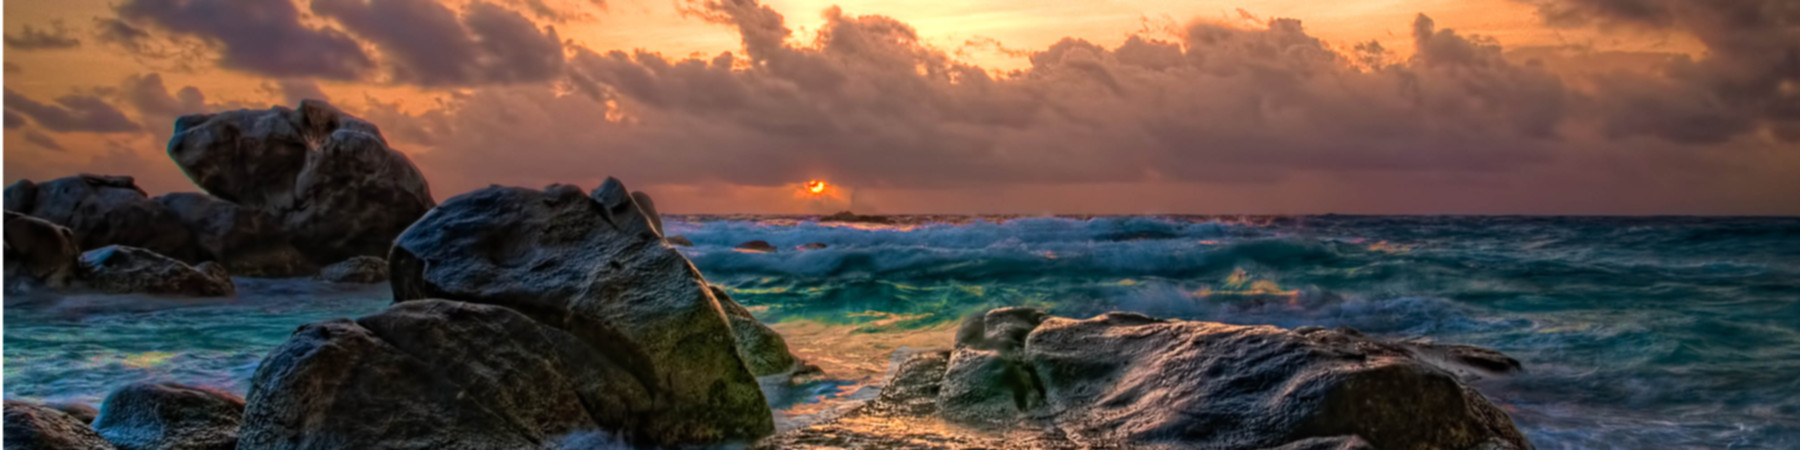 Aruba  Wikitravel